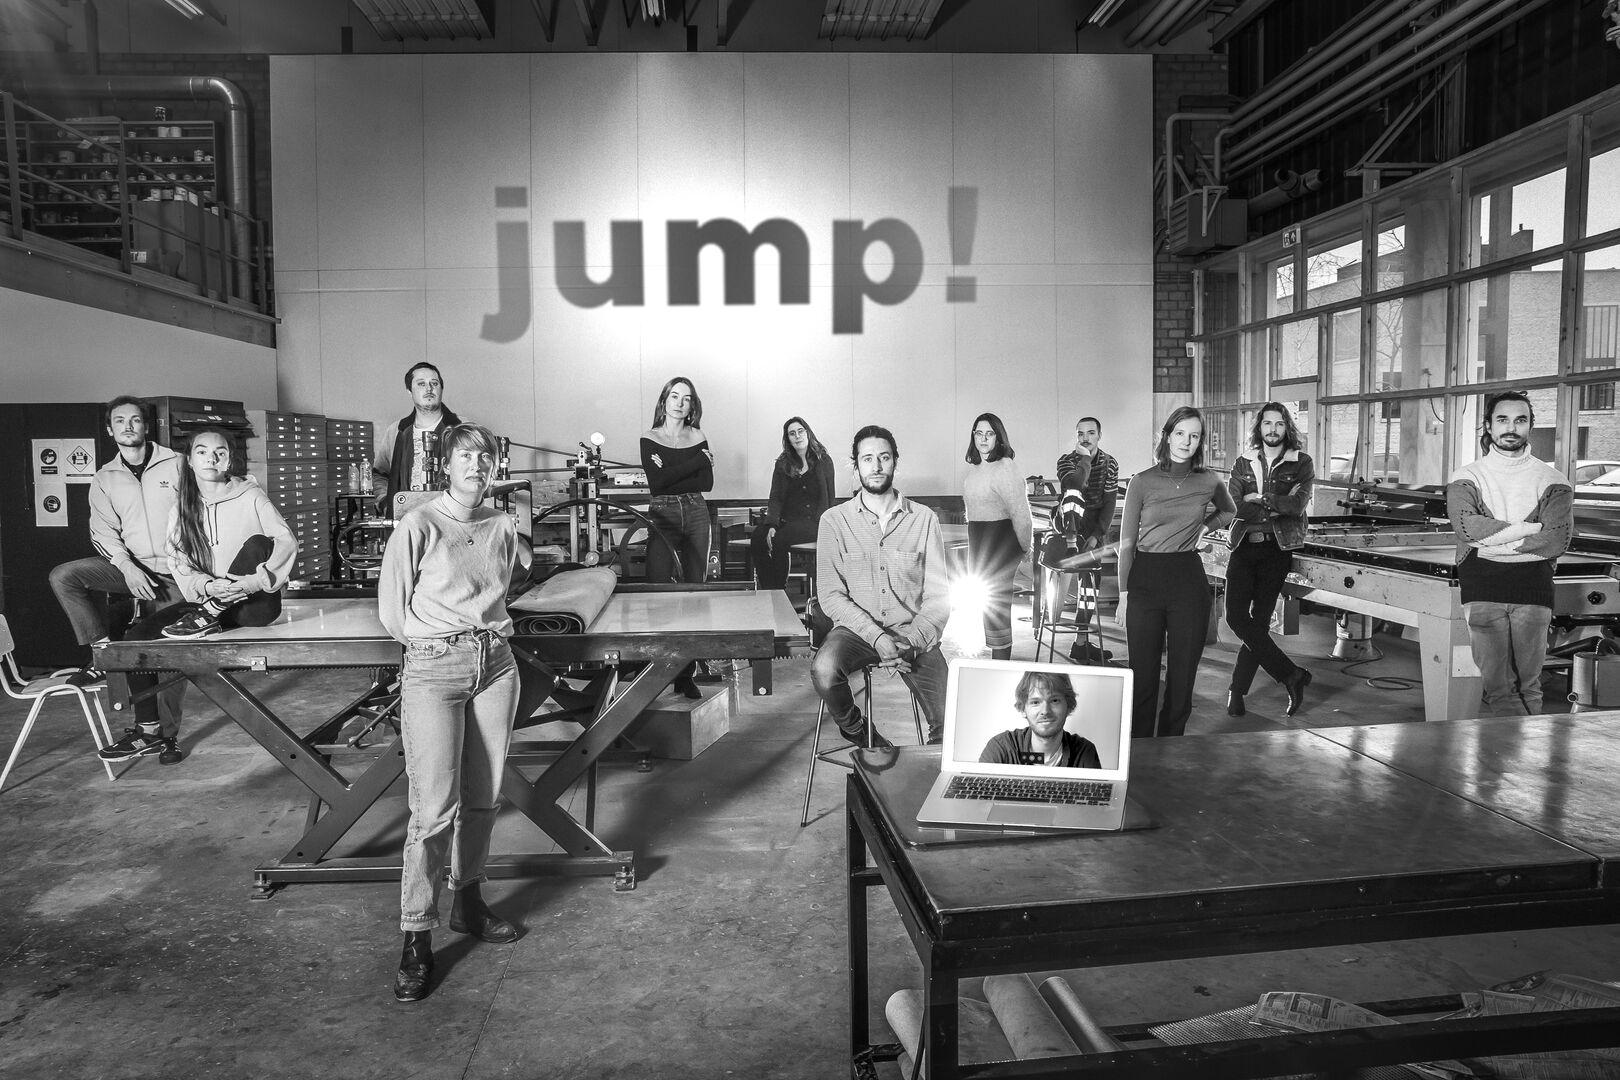 jump! 2021 the talents